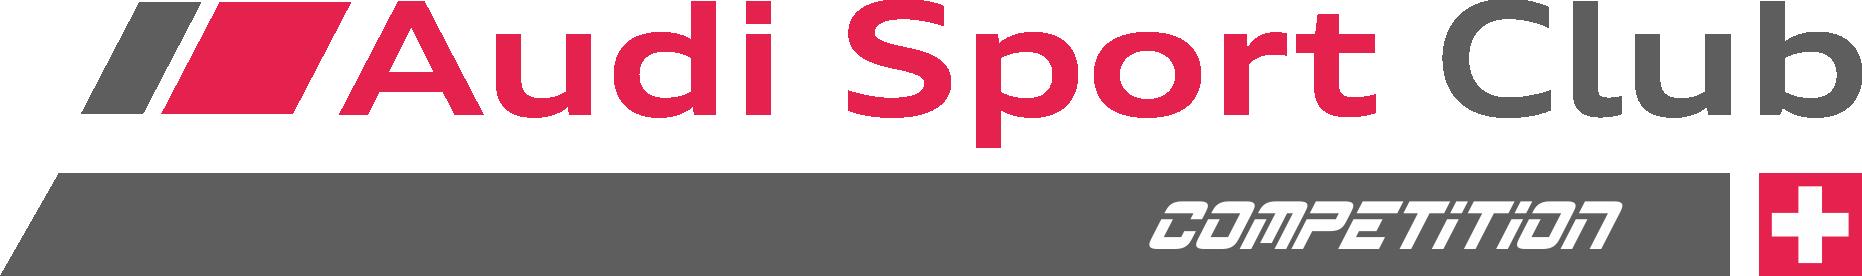 ascs, logo, png, version competition